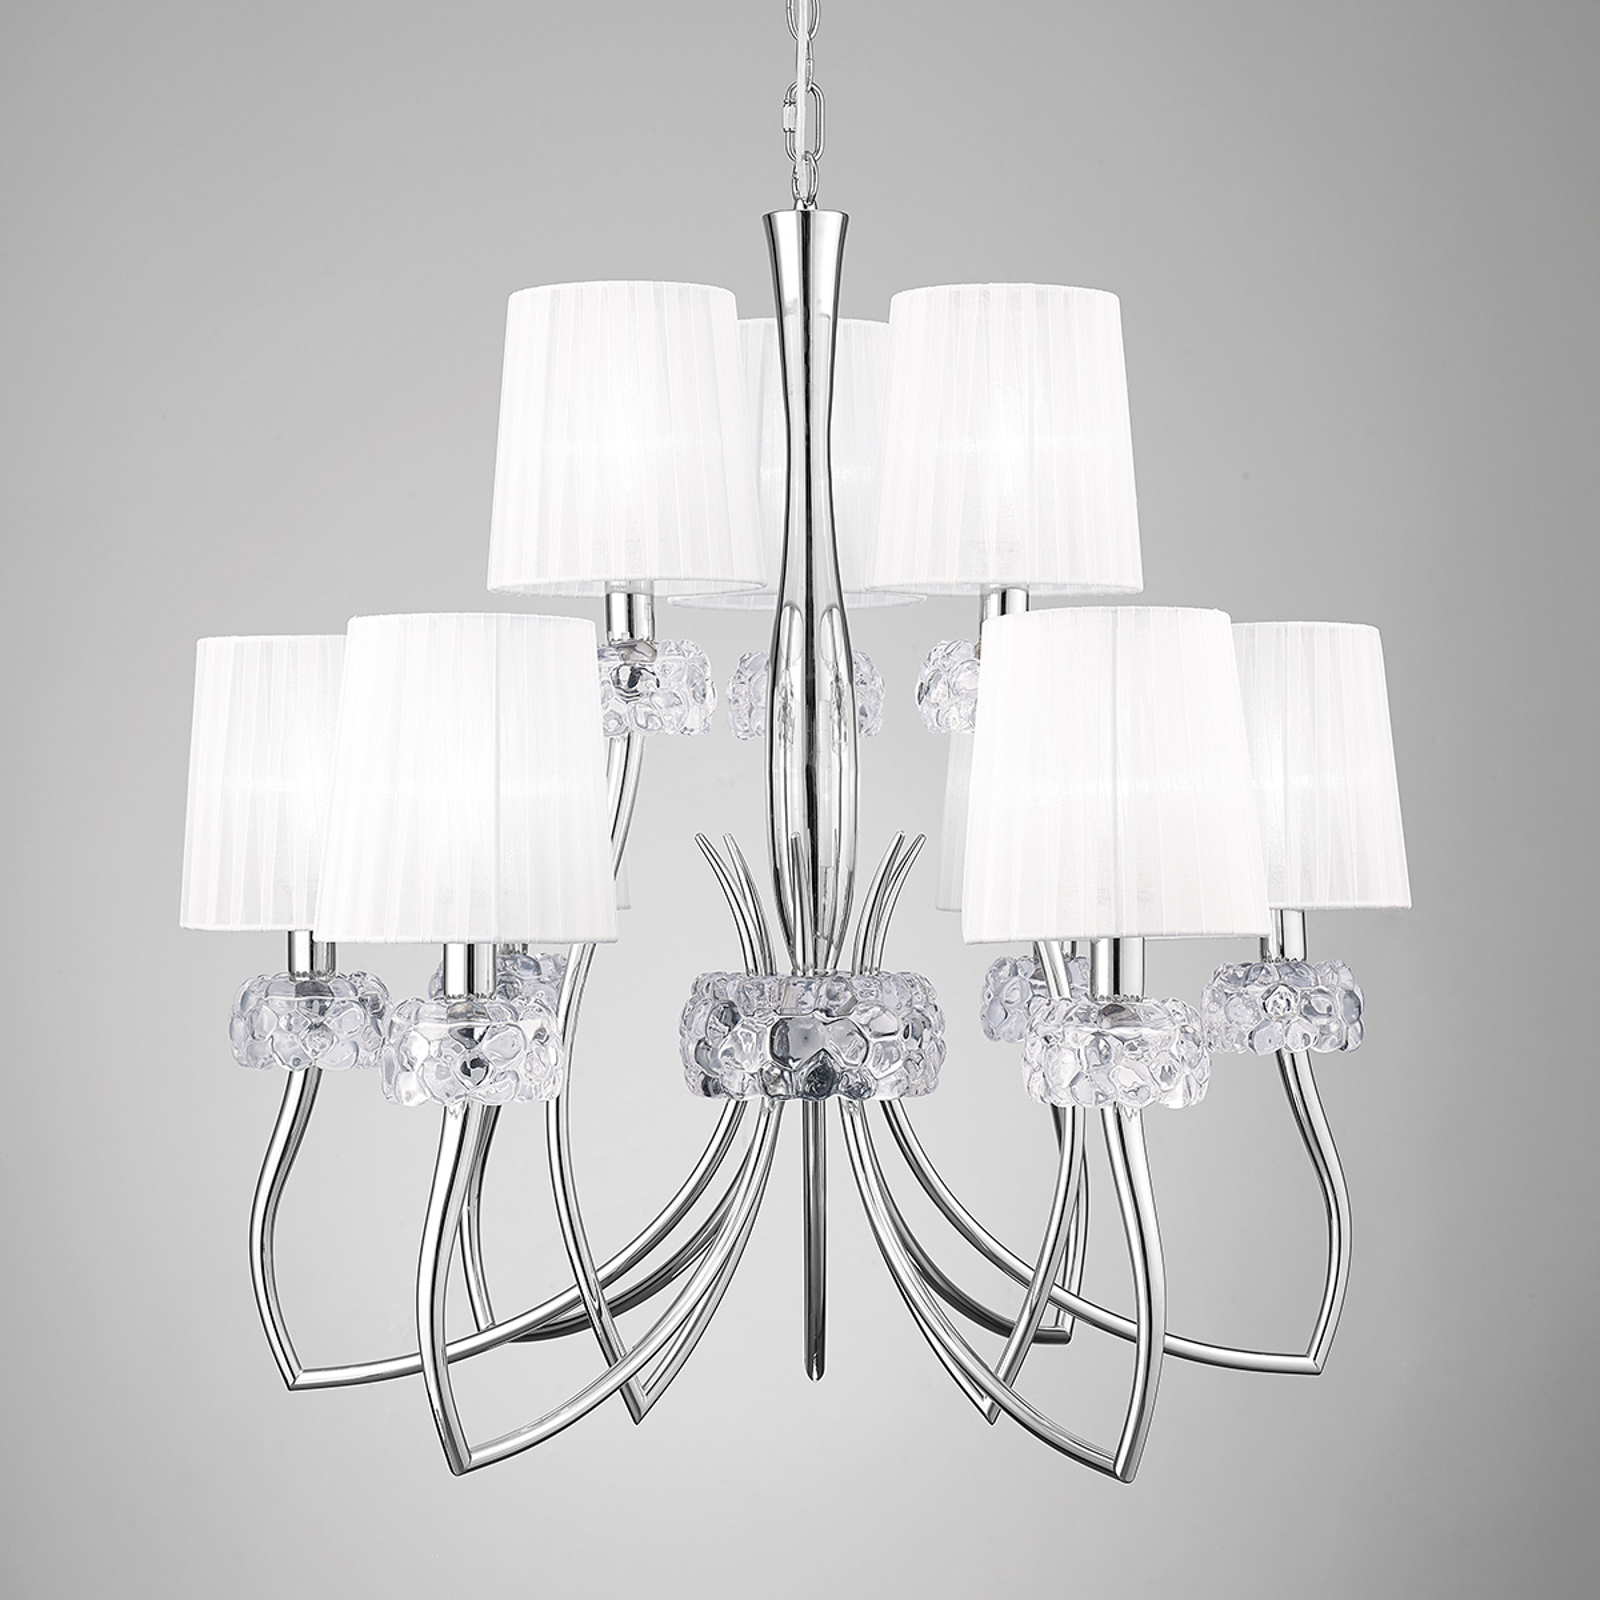 Elegant, 9-light fabric chandelier Lara_6542307_1